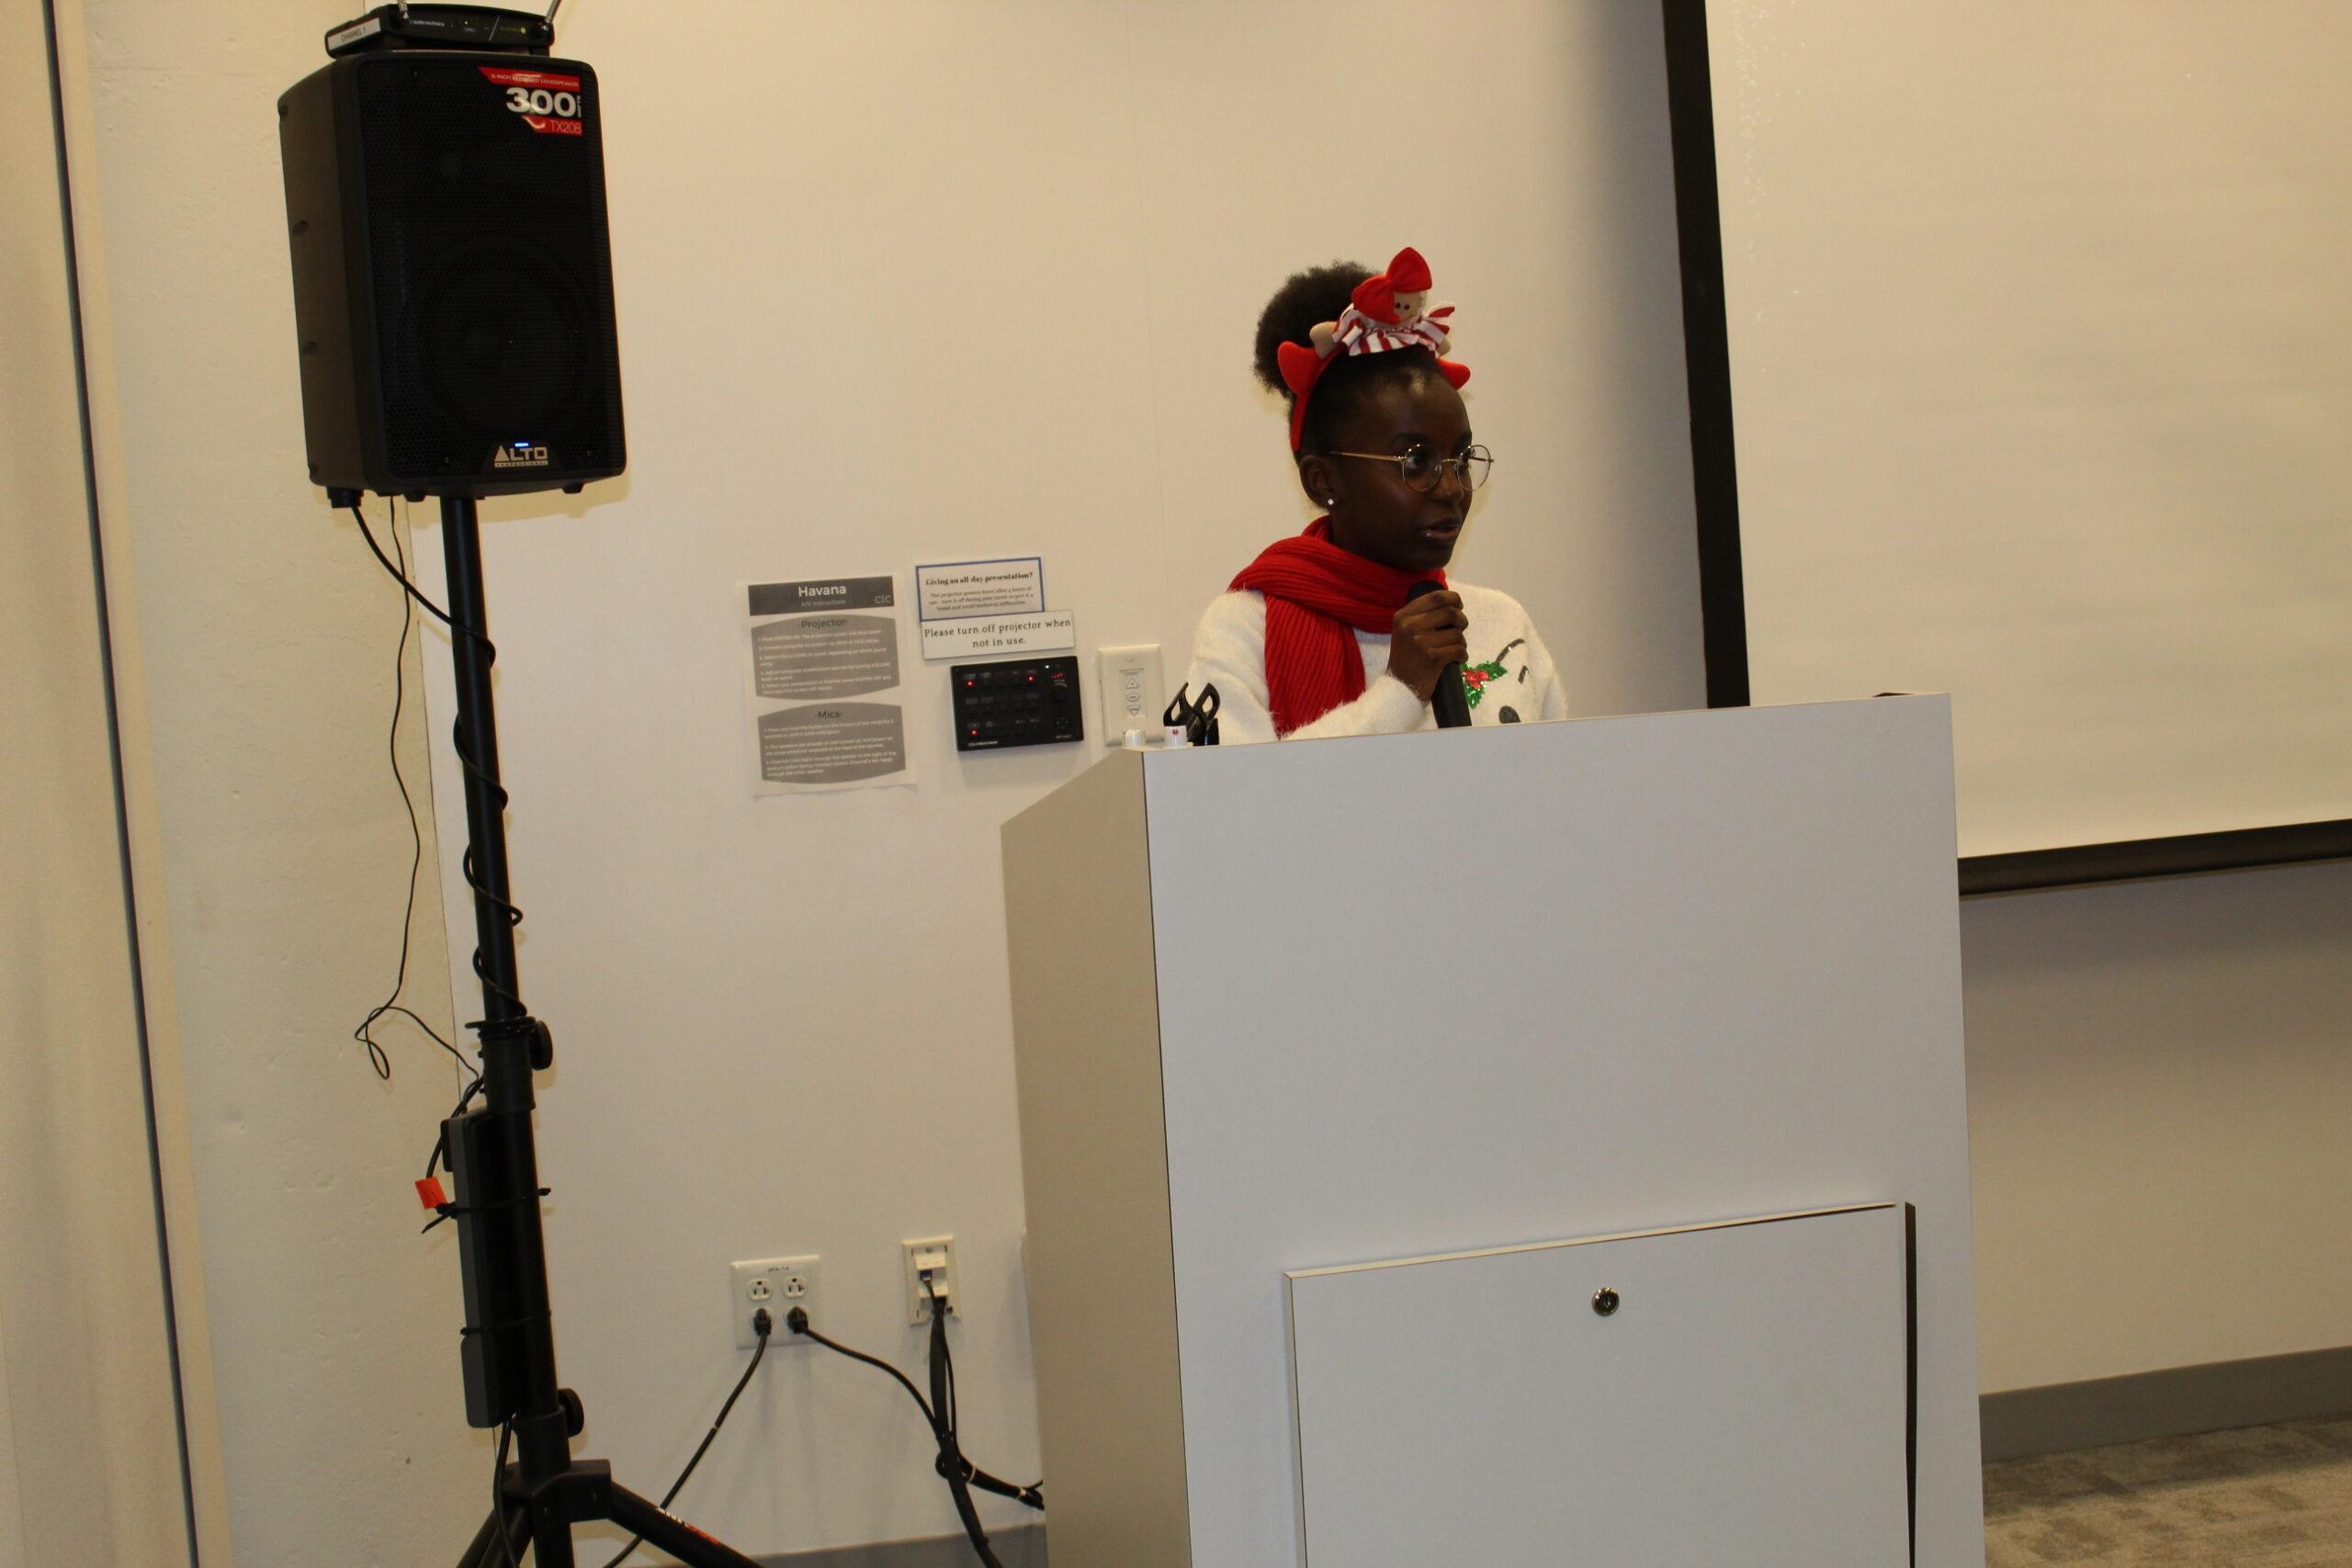 Miss.Bridget Mwaniki speaking to the immigrants at Cortex building in Saint Louis City, U.S